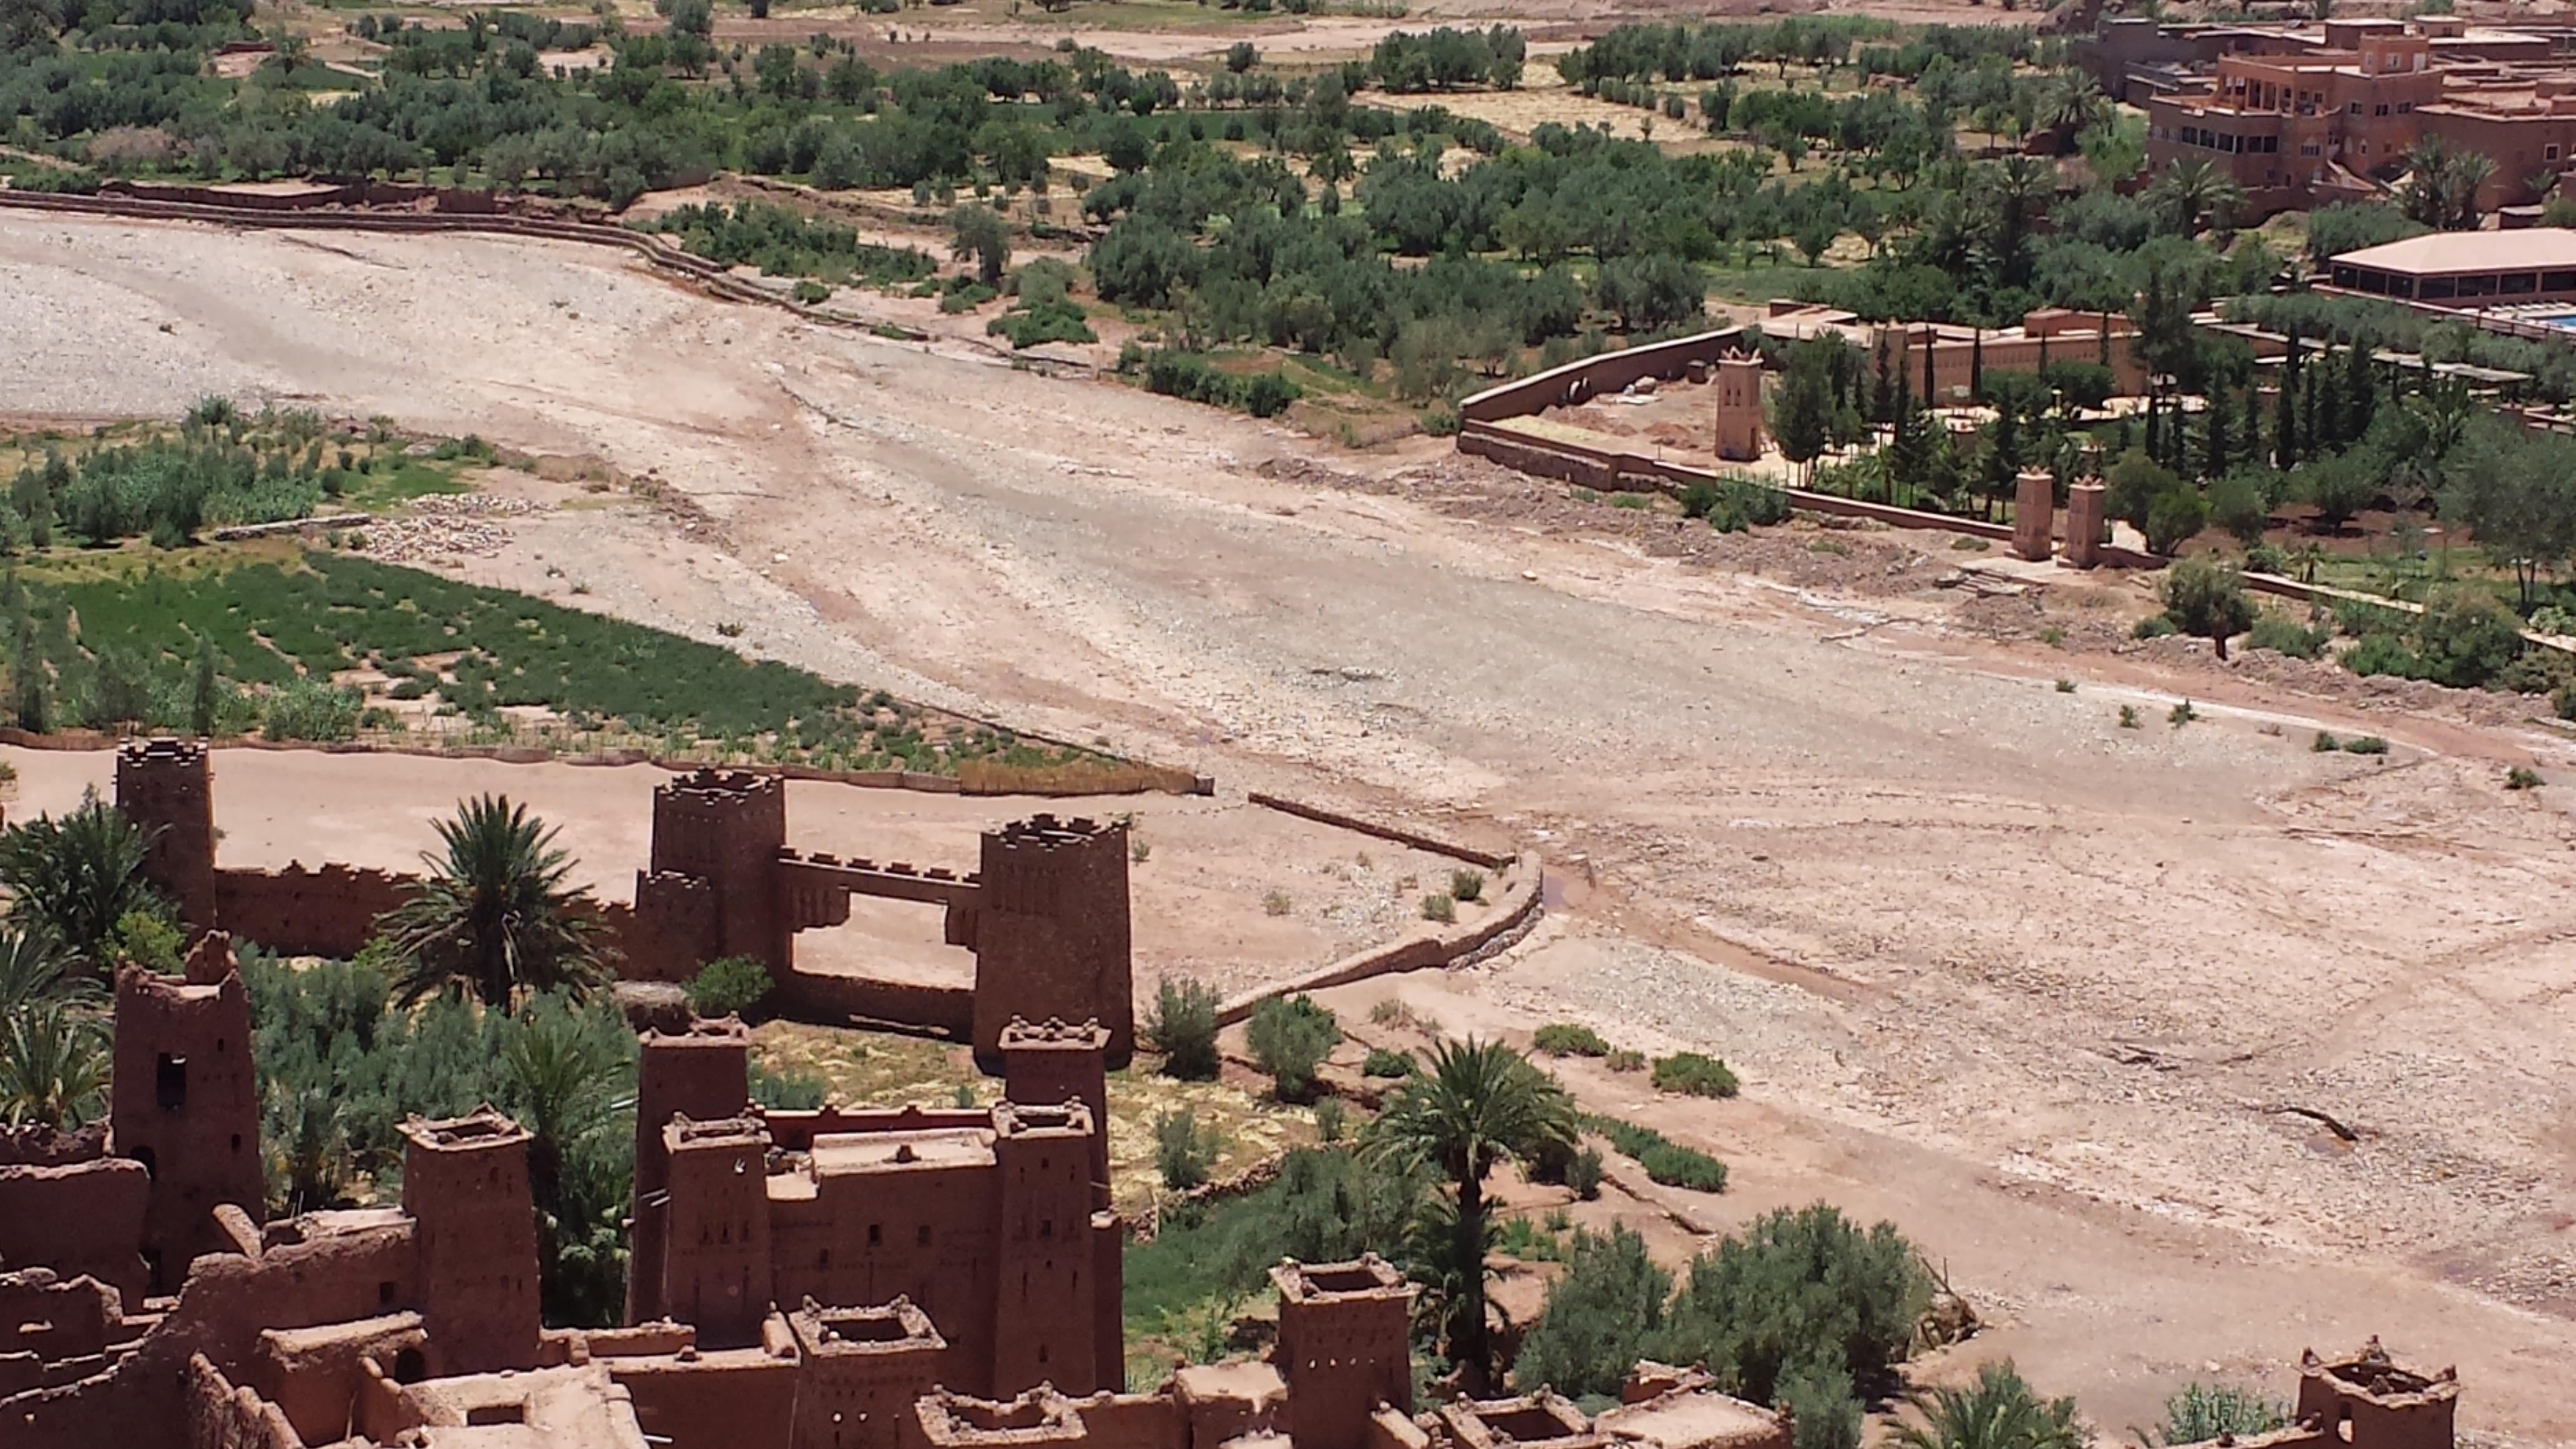 Merzouga-desert-tour-ending-in-Fez-2